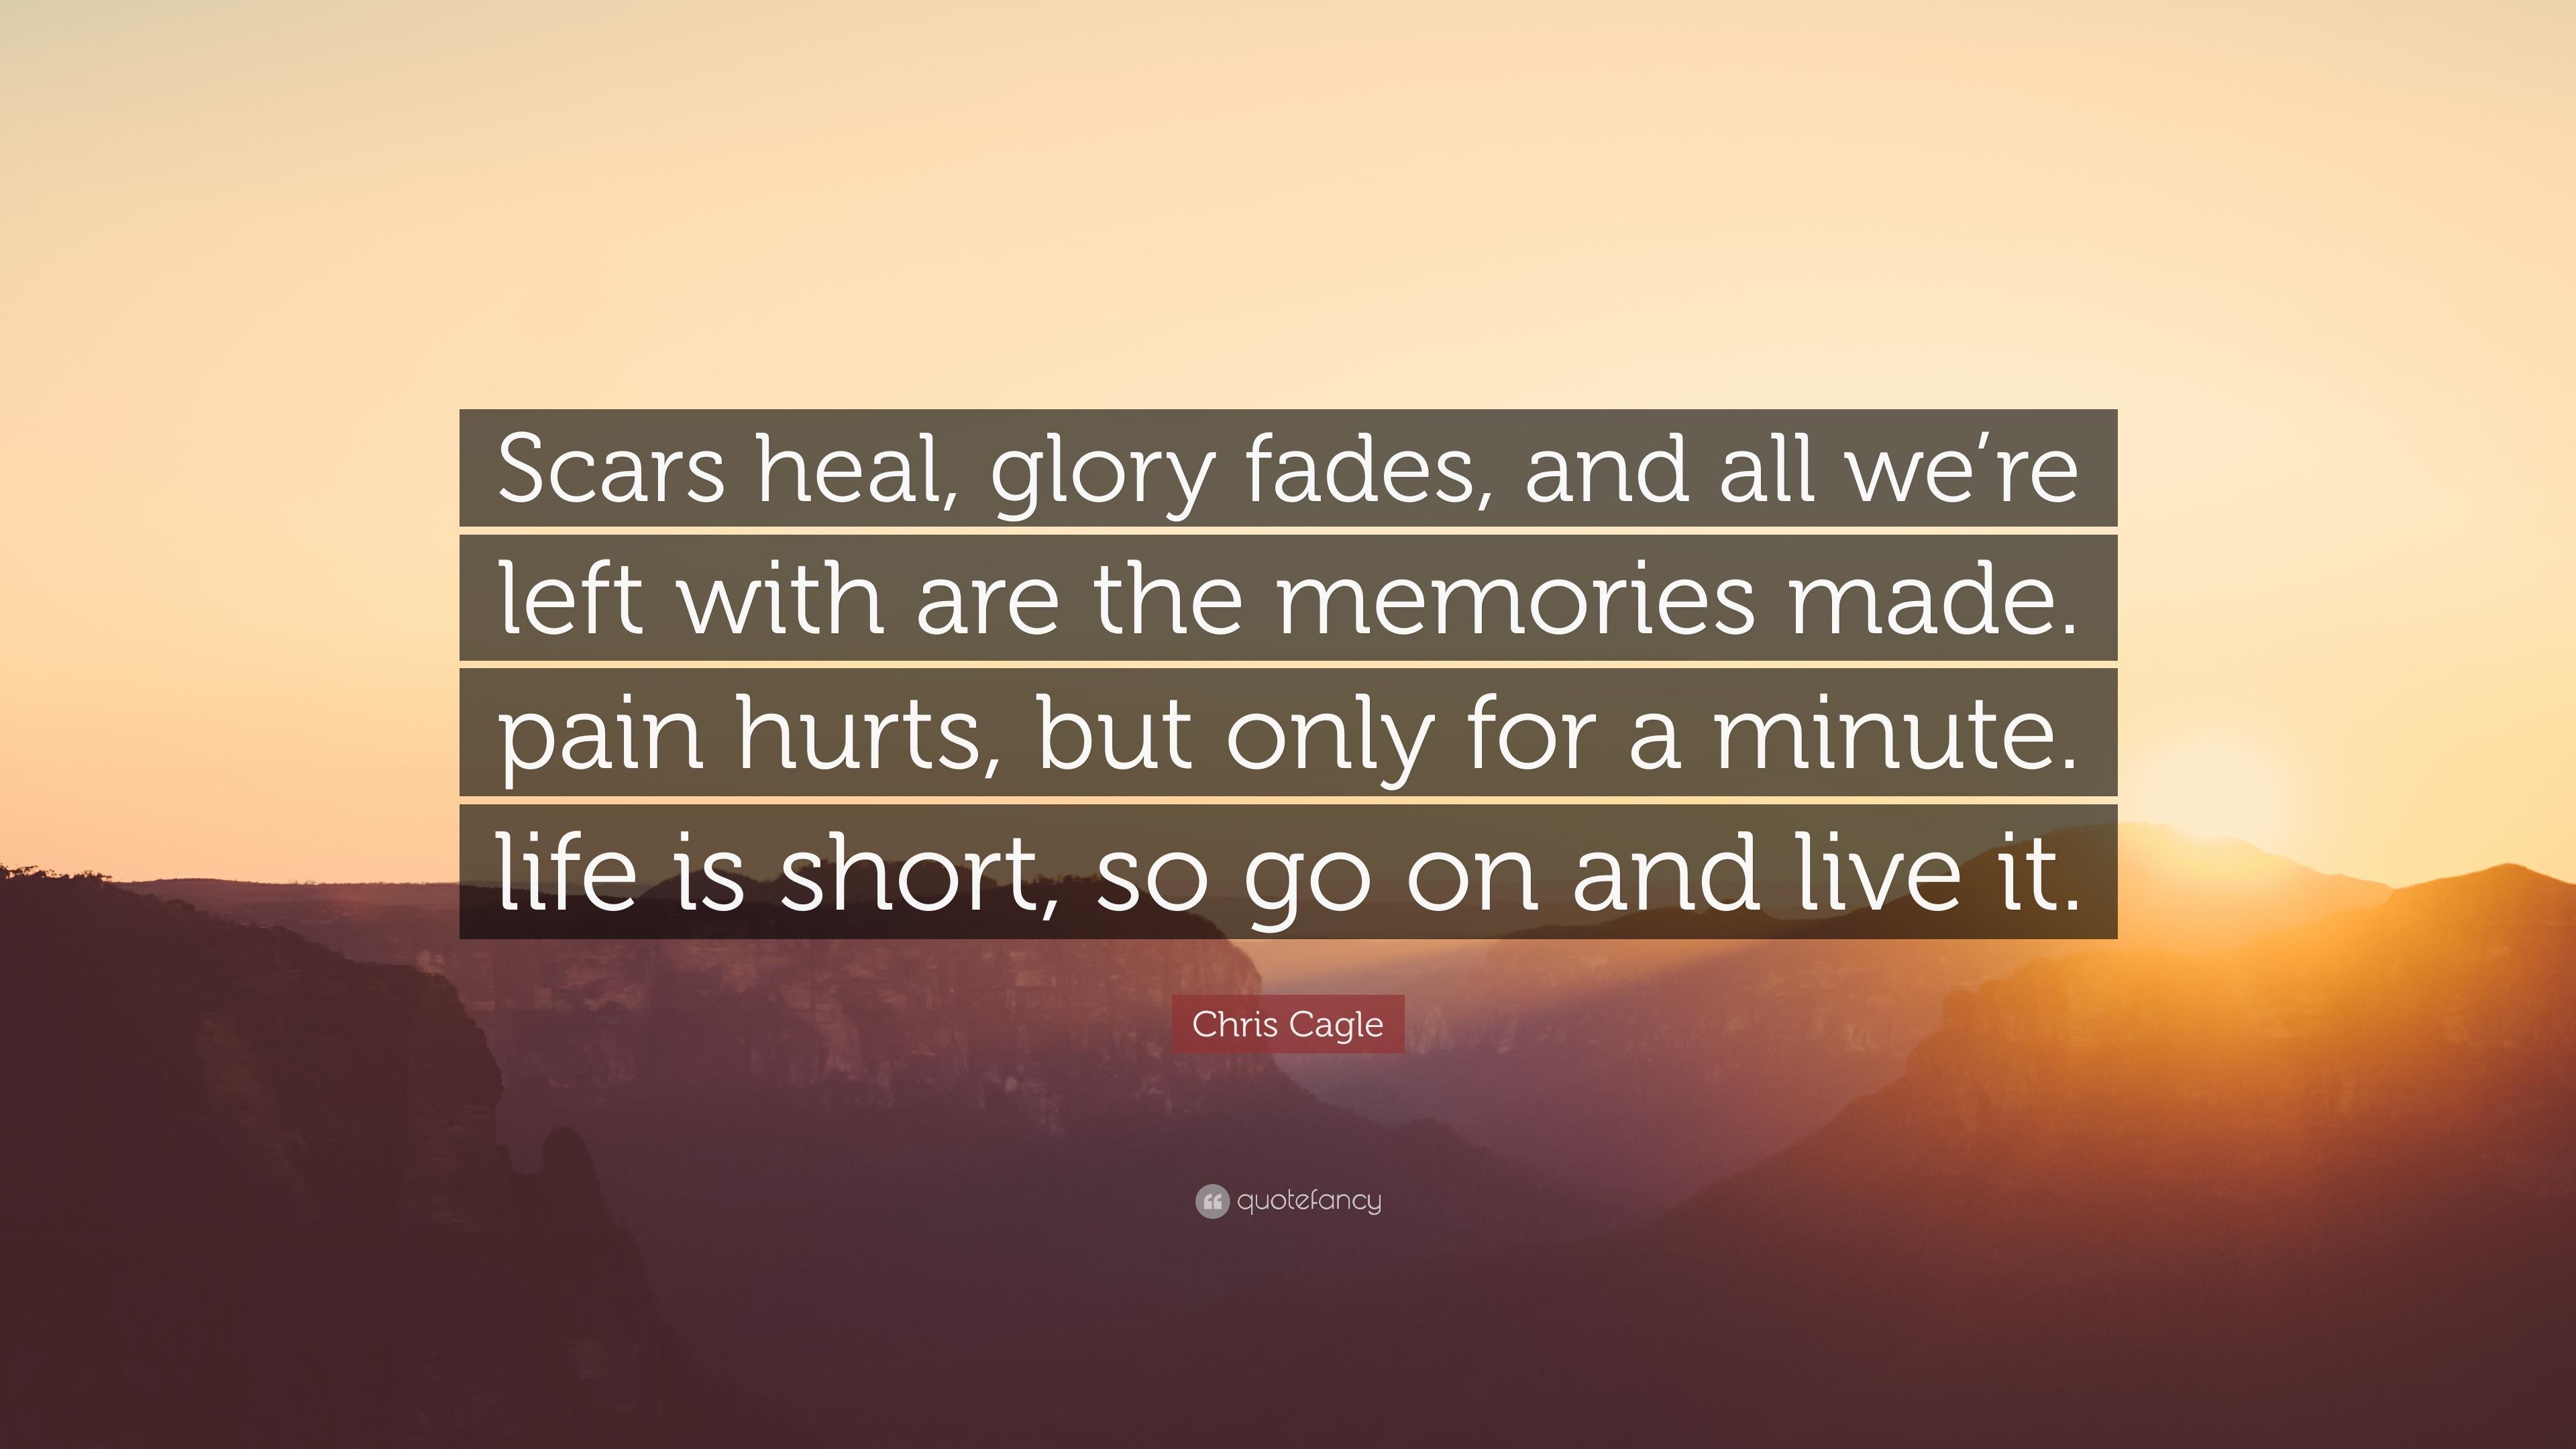 Scars heal glory fades